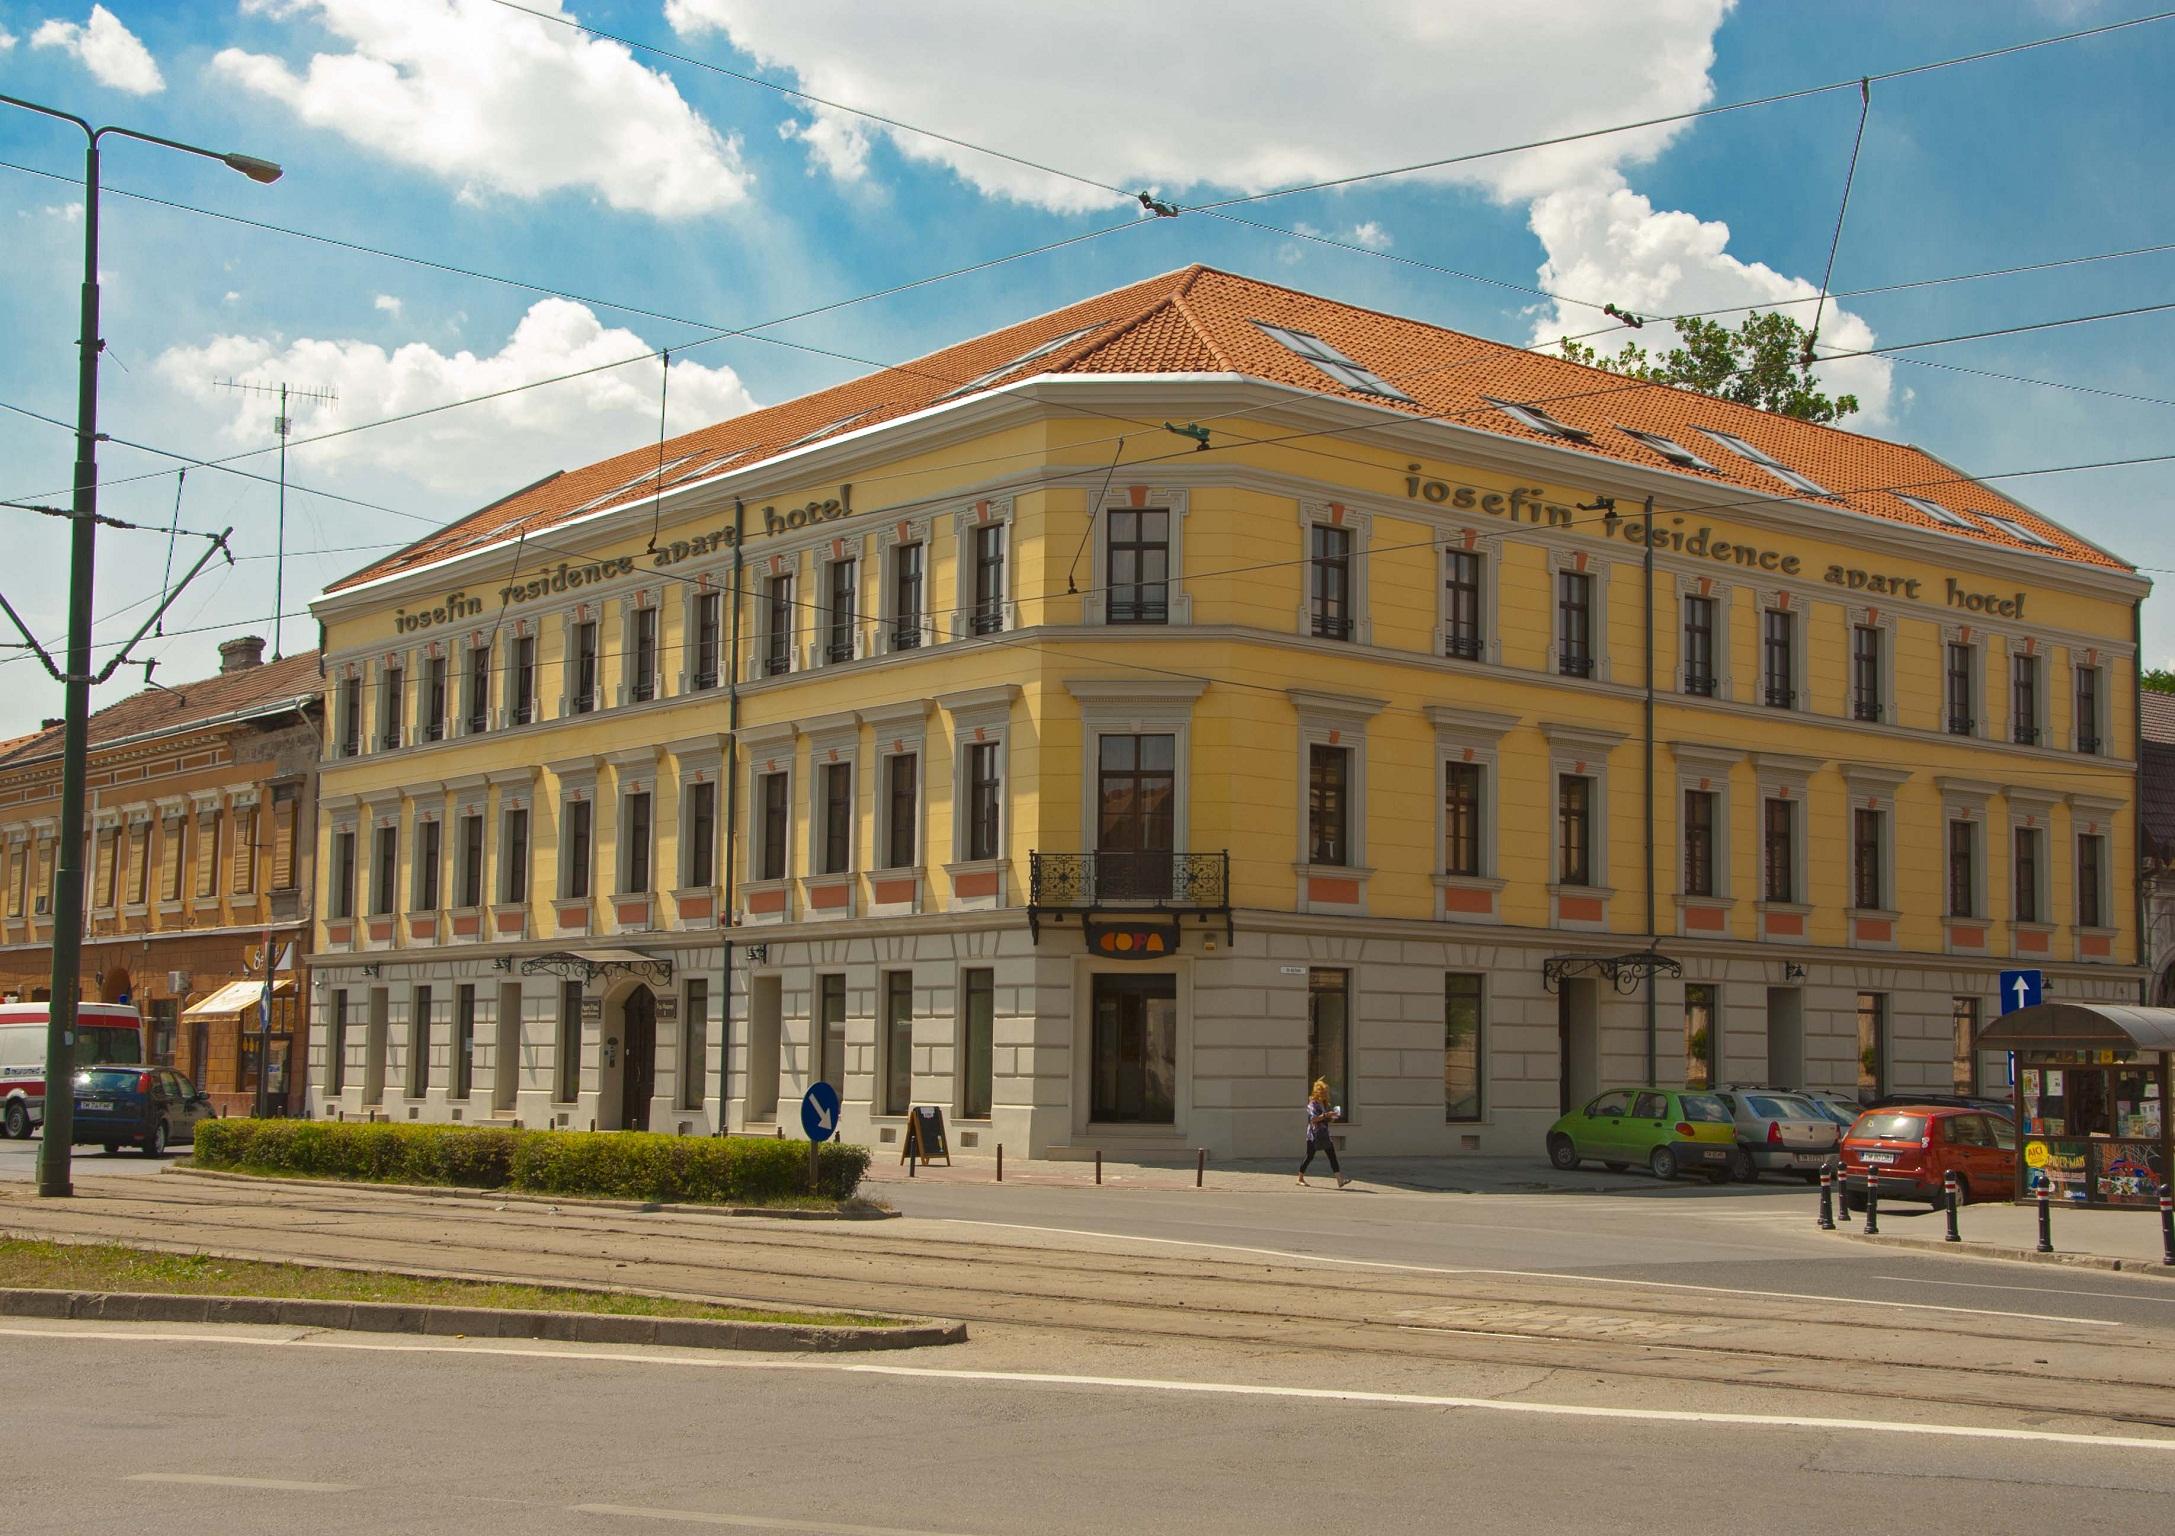 Iosefin Residence Aparthotel, Timisoara